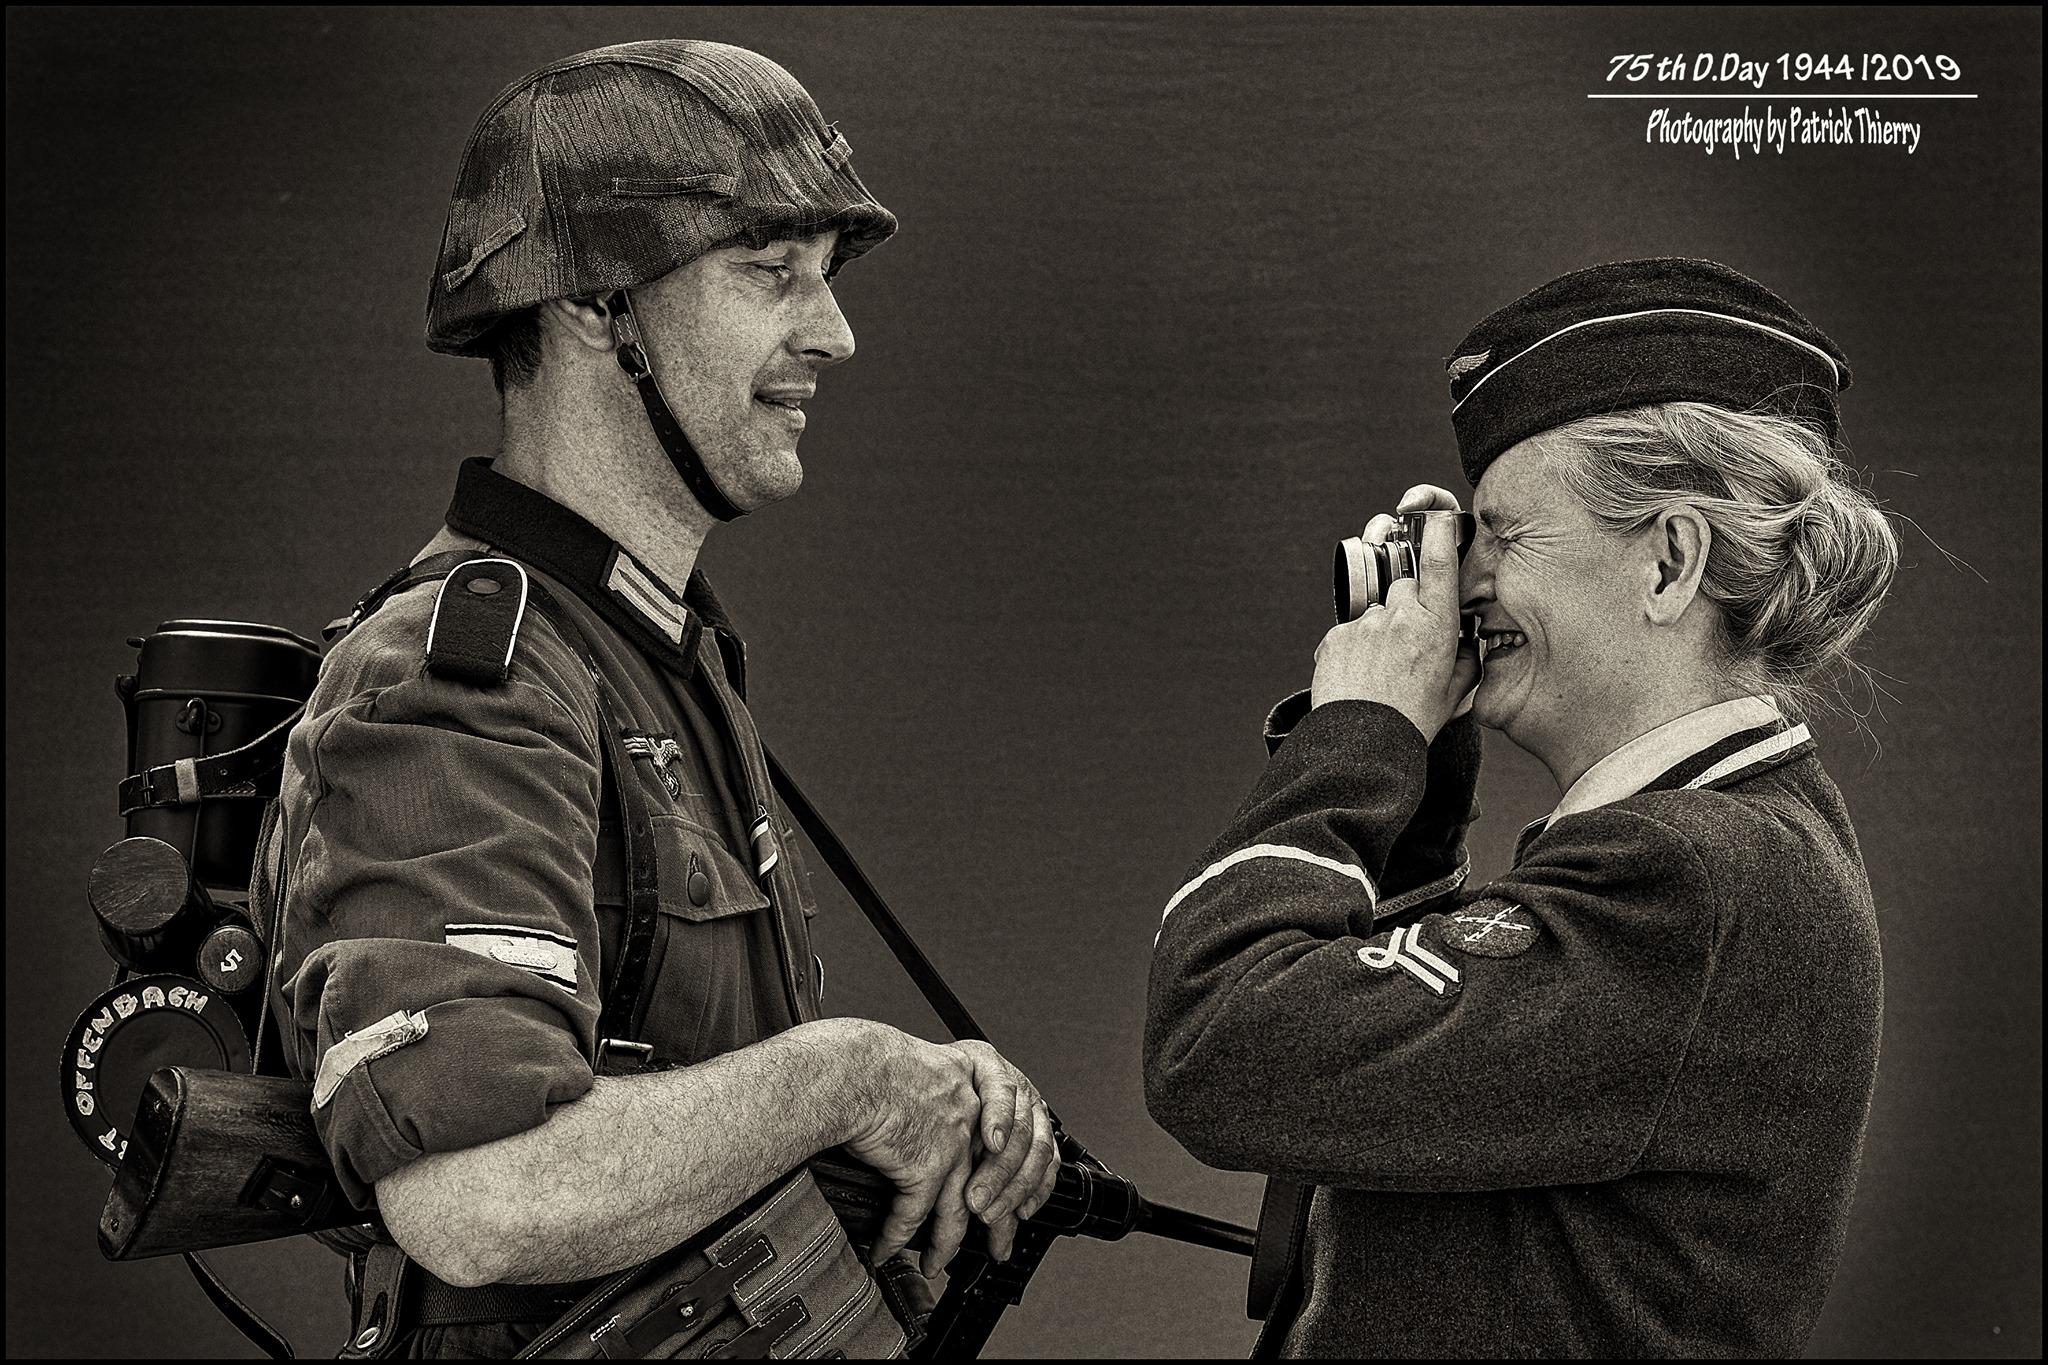 0006 soldat allemand WW2 79TH MEMORY GRO